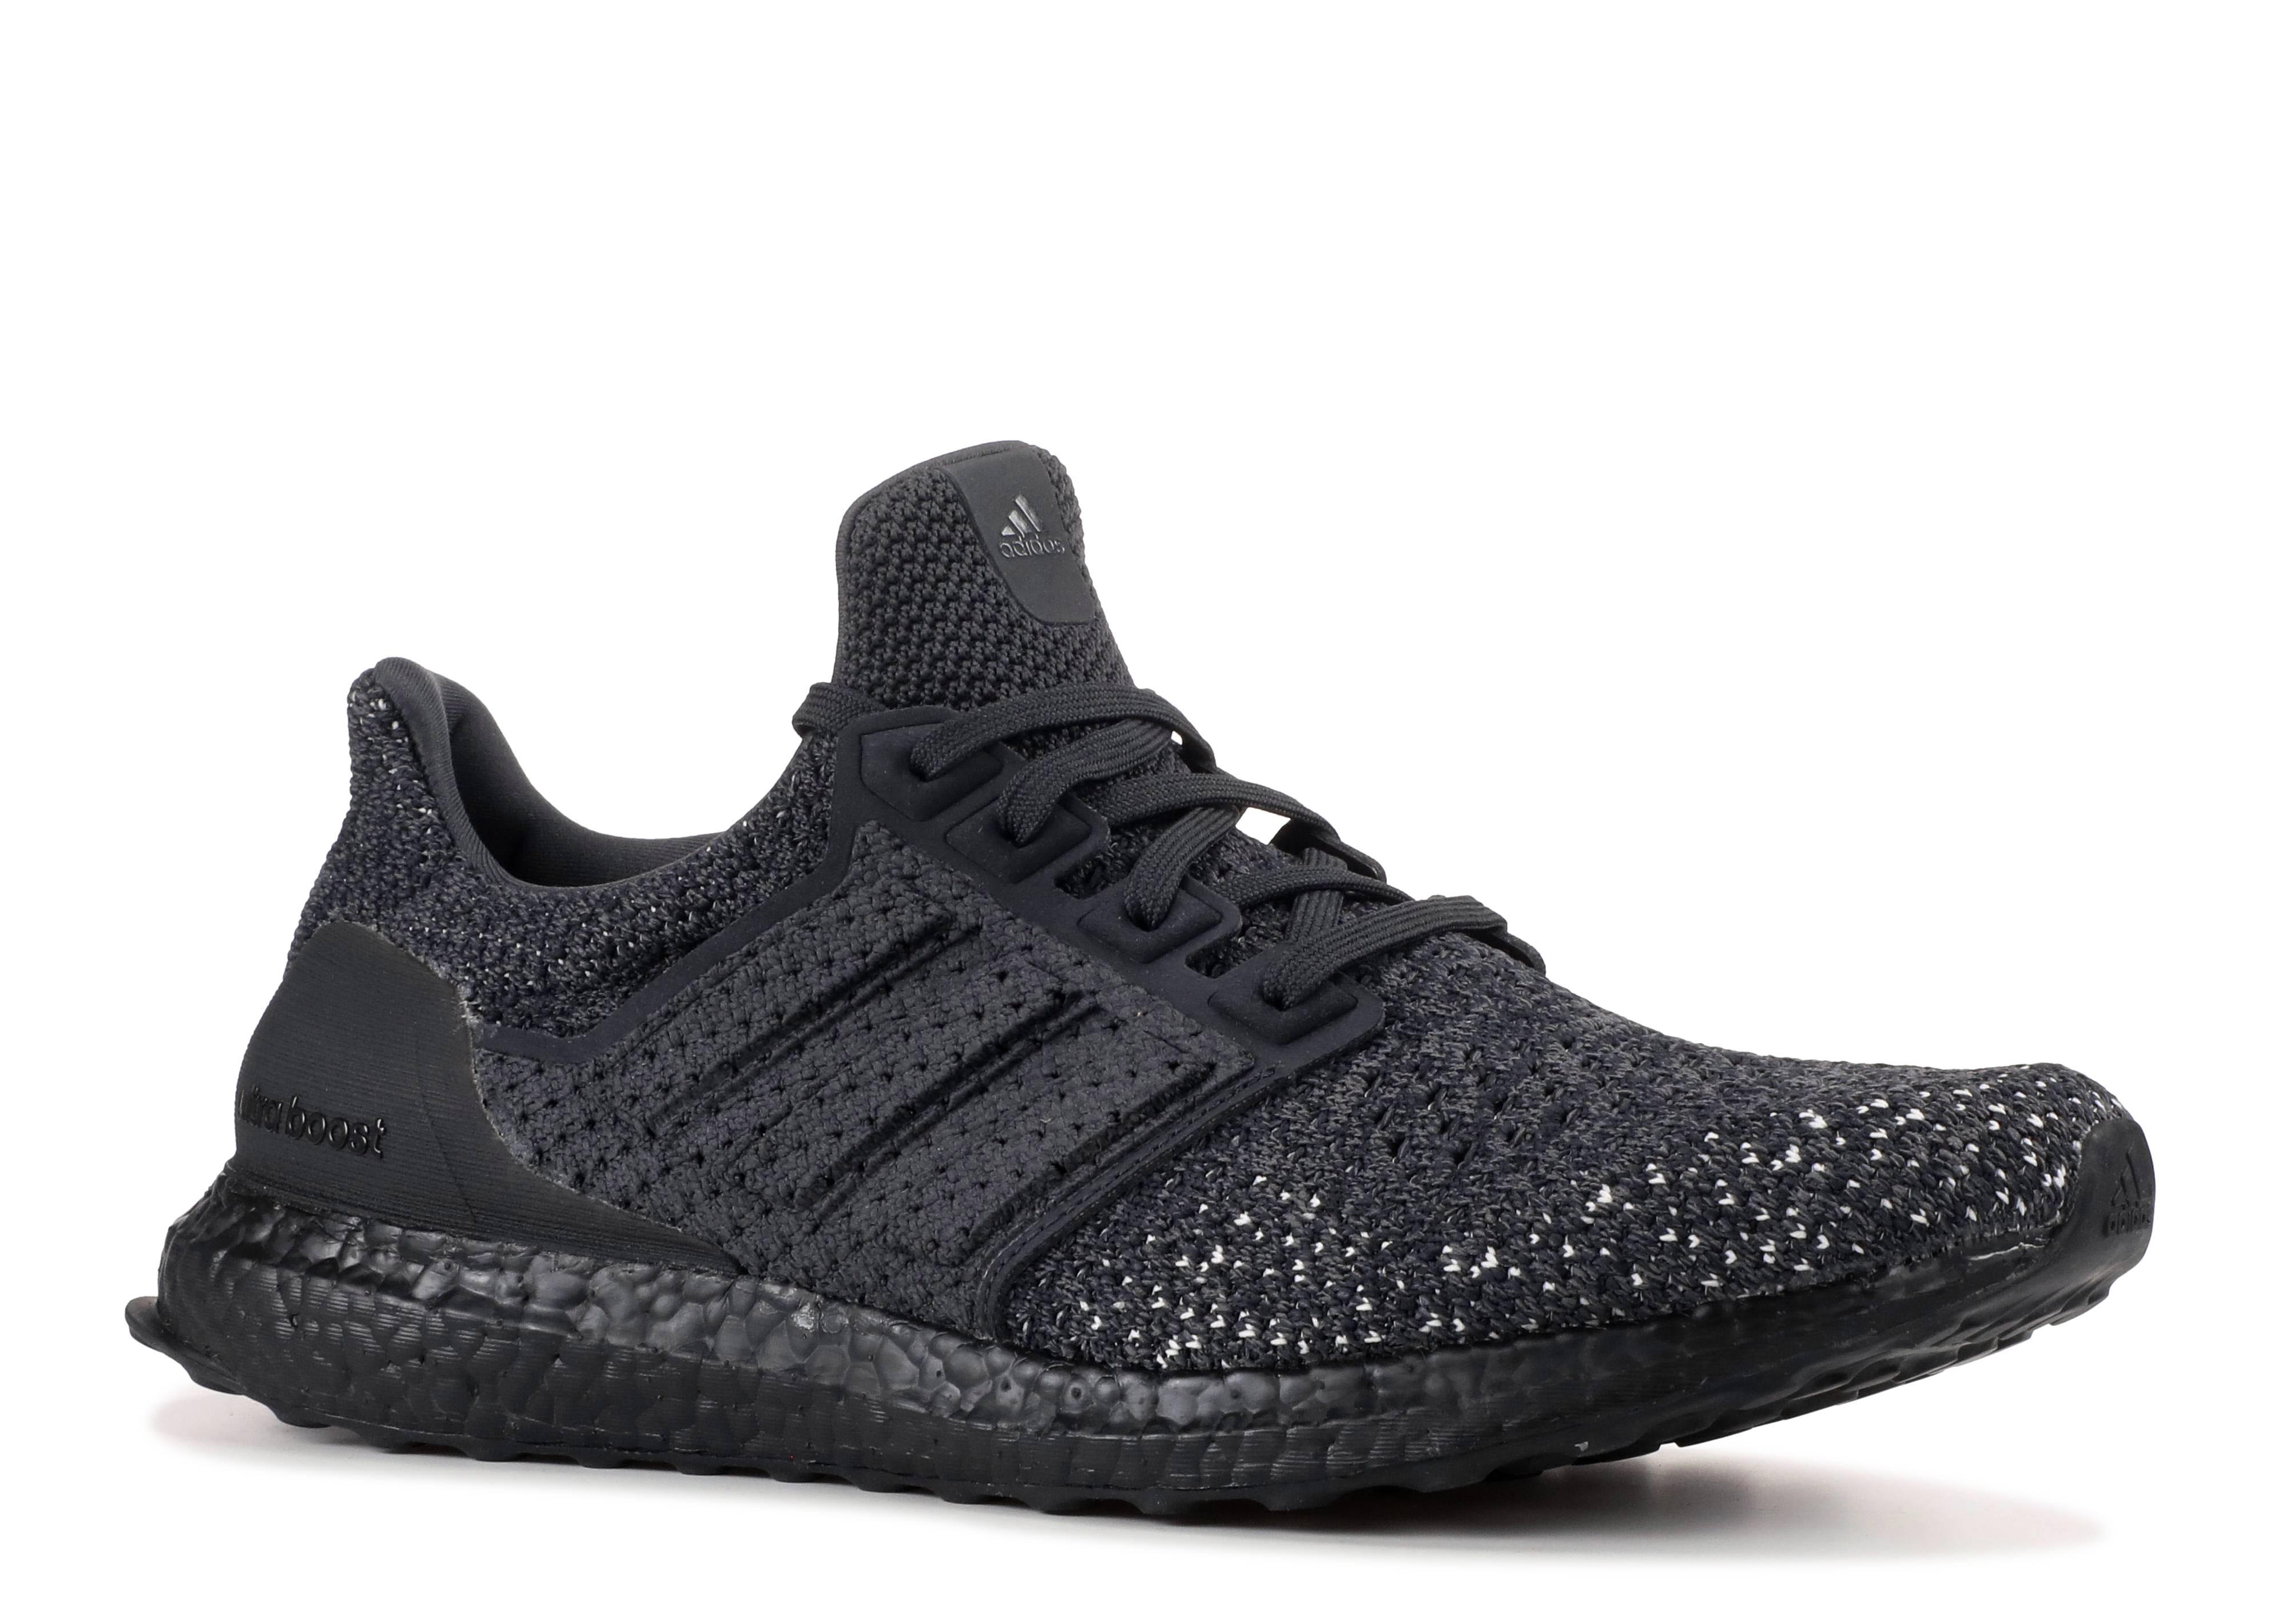 UltraBOOST CLIMA - Adidas - cq0022 - black ash white  605d7f7b77fb